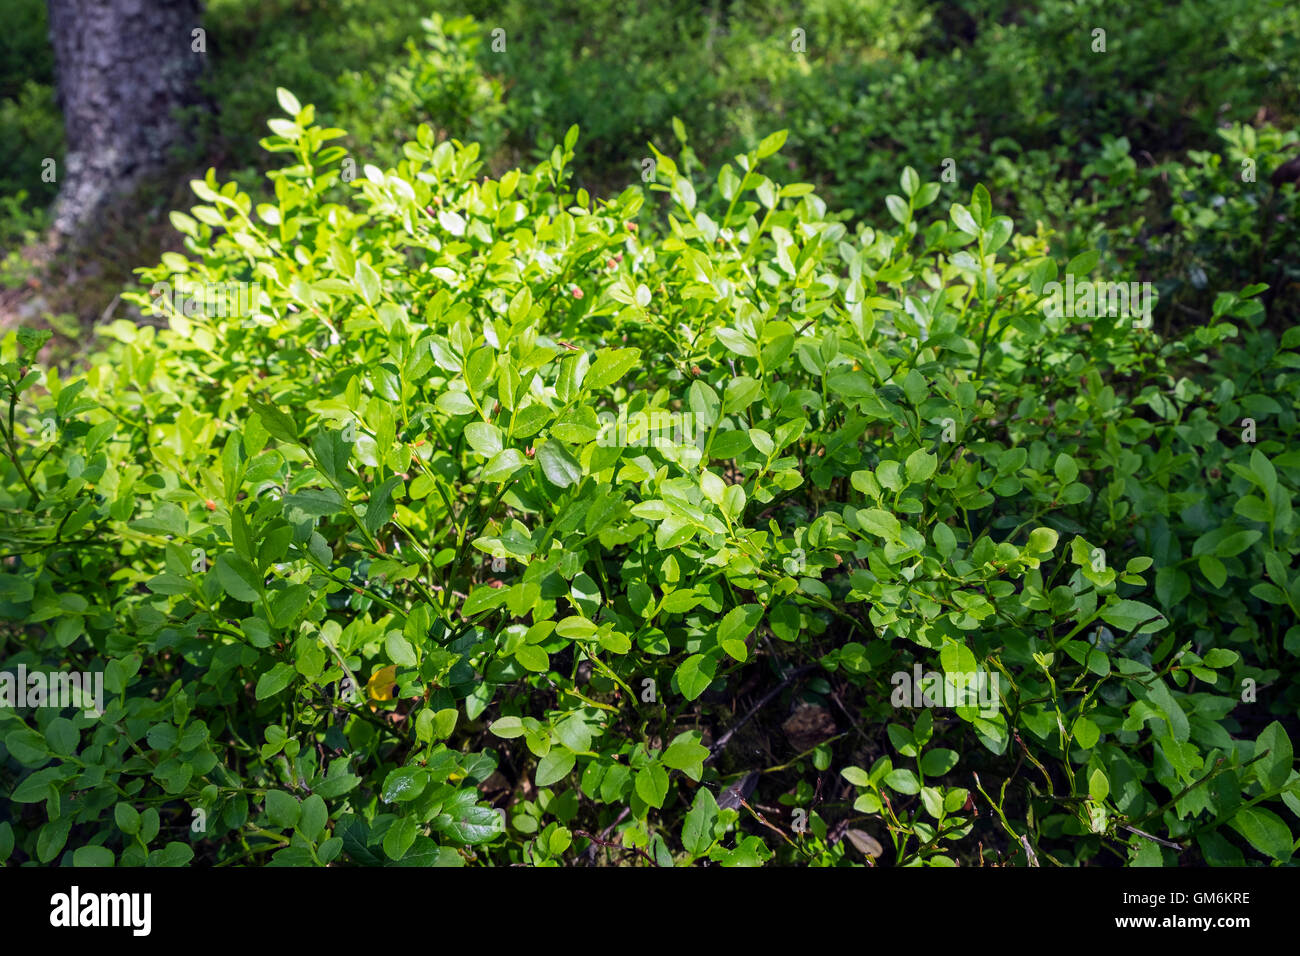 Bilberry sprigs (Vaccinium myrtillus) - Stock Image